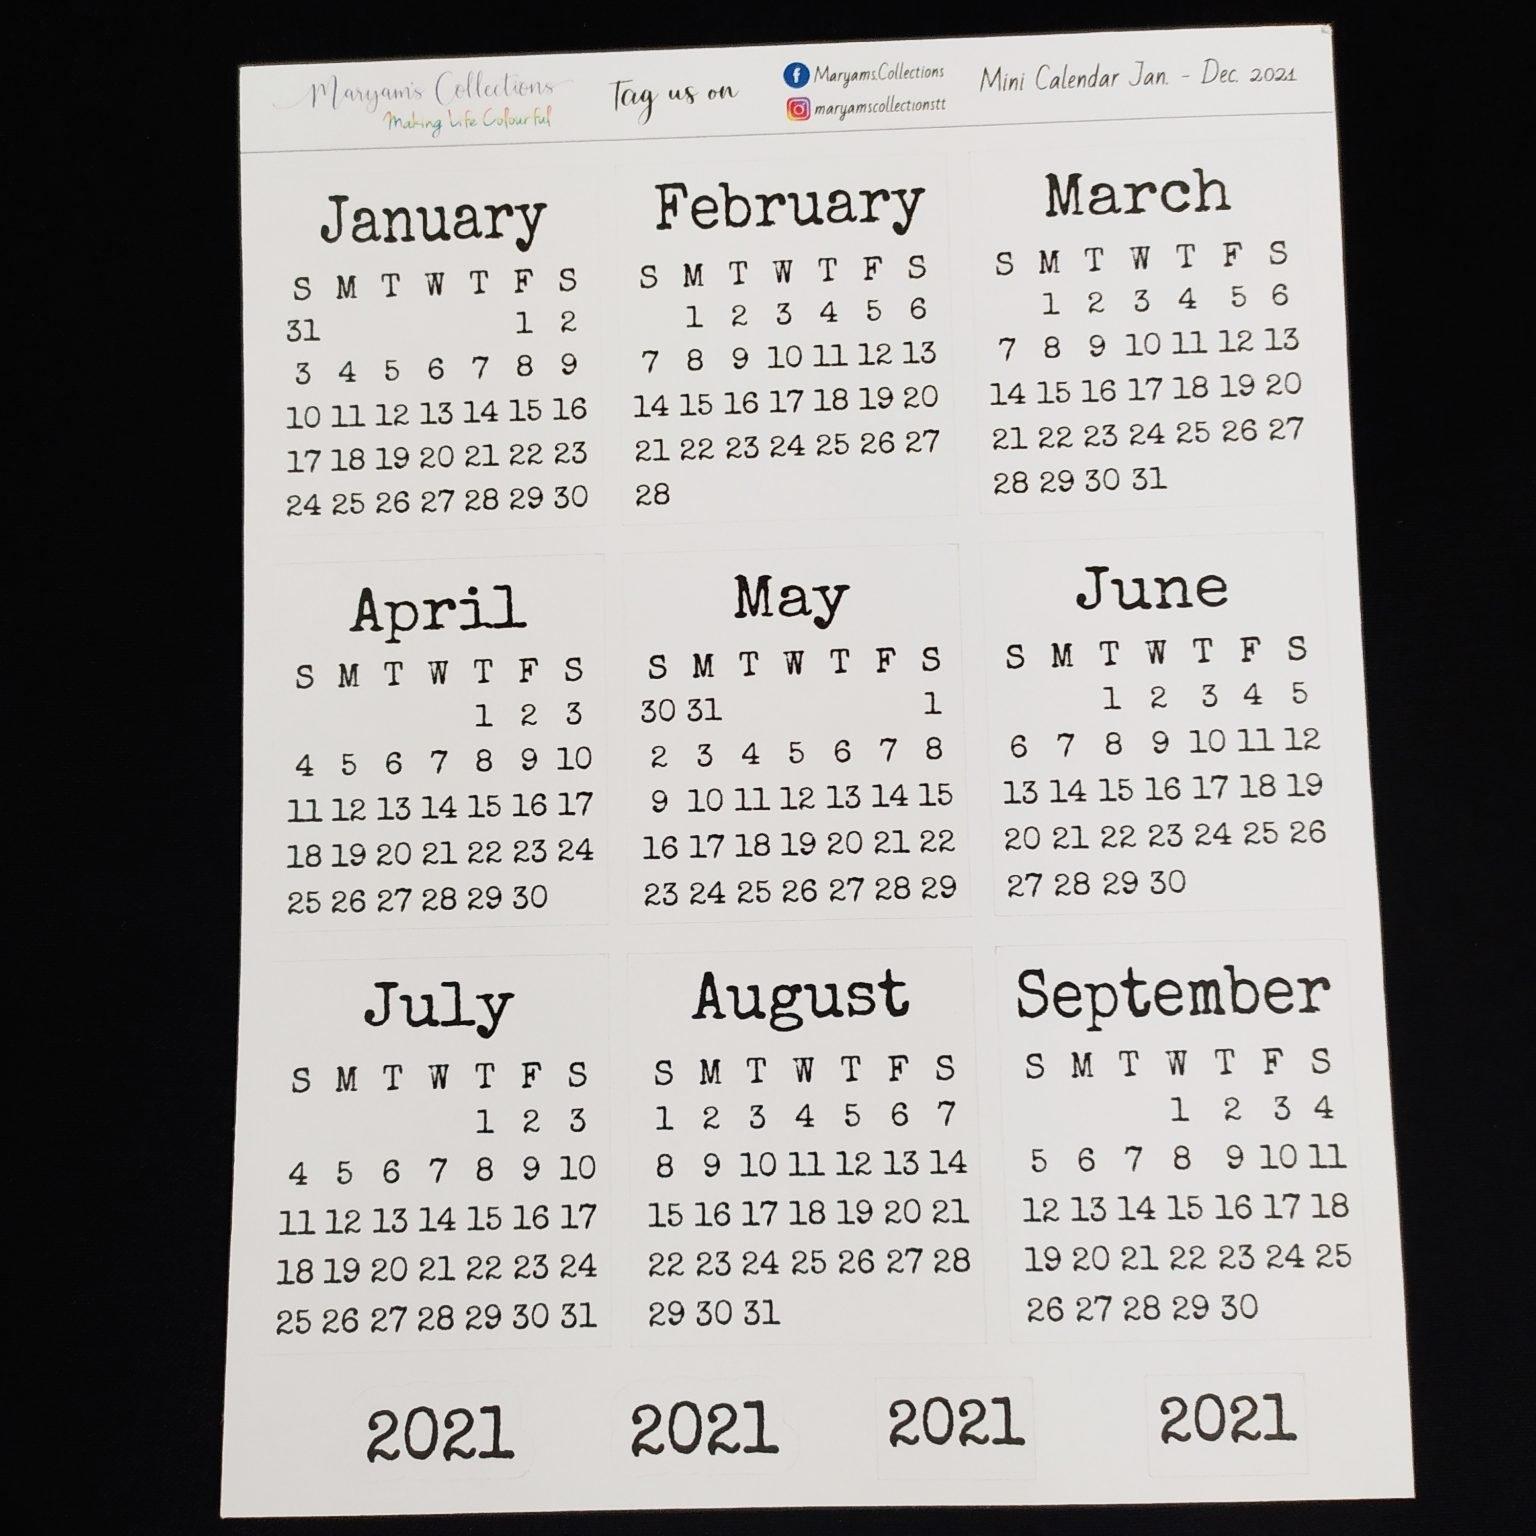 2021 Mini Calendar Stickers - V2 ' - Planting Seeds Digital Pop Up Shop intended for Trinidad And Tobago Holidays 2021 Graphics